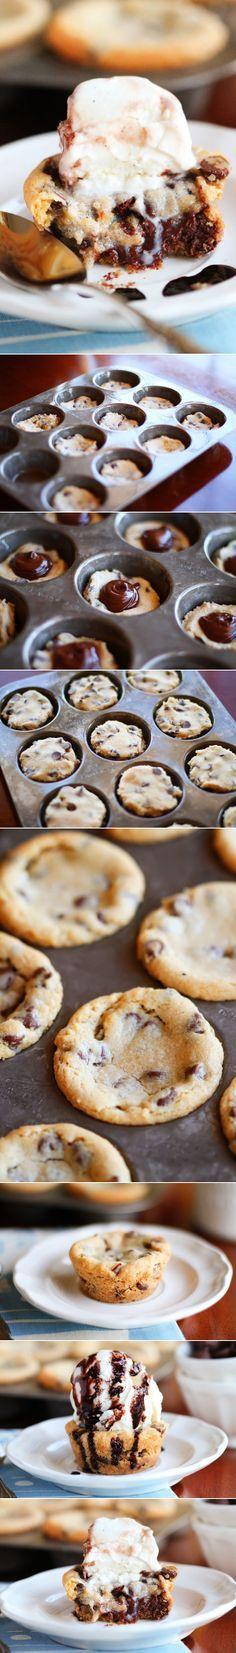 Deep Dish Chocolate Chip Molten Lava Cookies